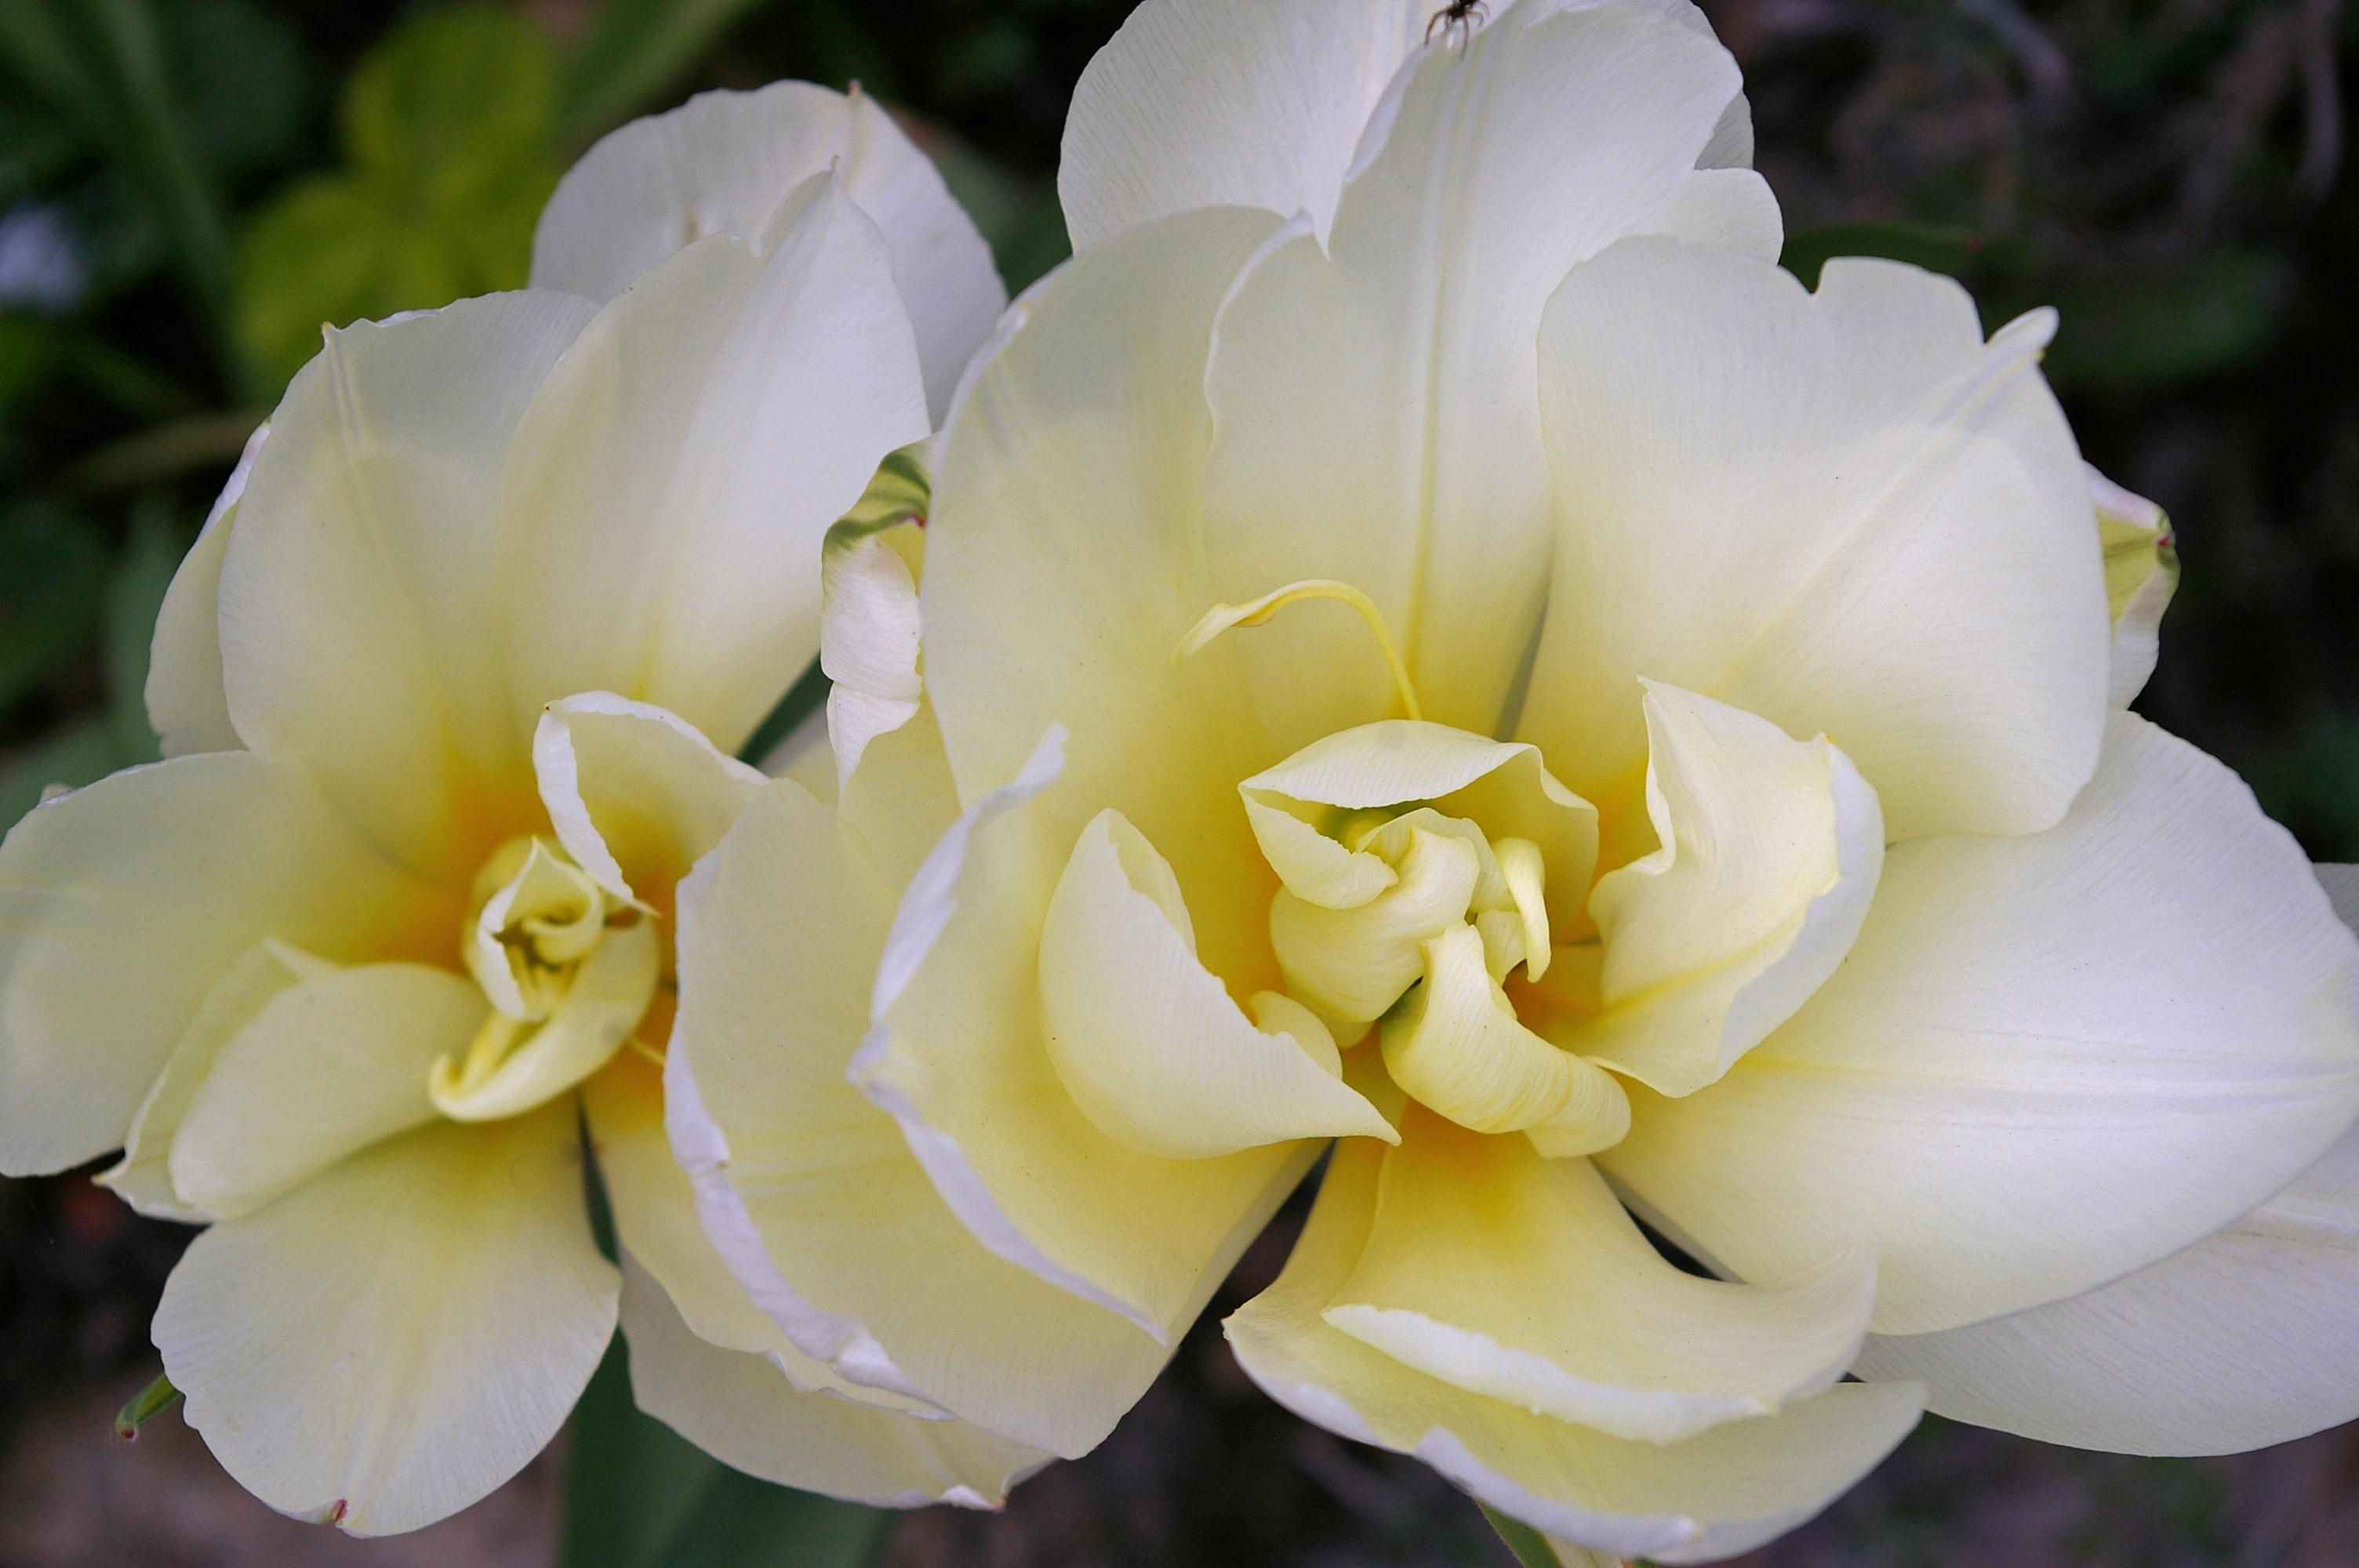 free images nature blossom open petal bloom rose spring botany yellow garden decor flora flower bed exotic floristry awakening - Open Garden Decor